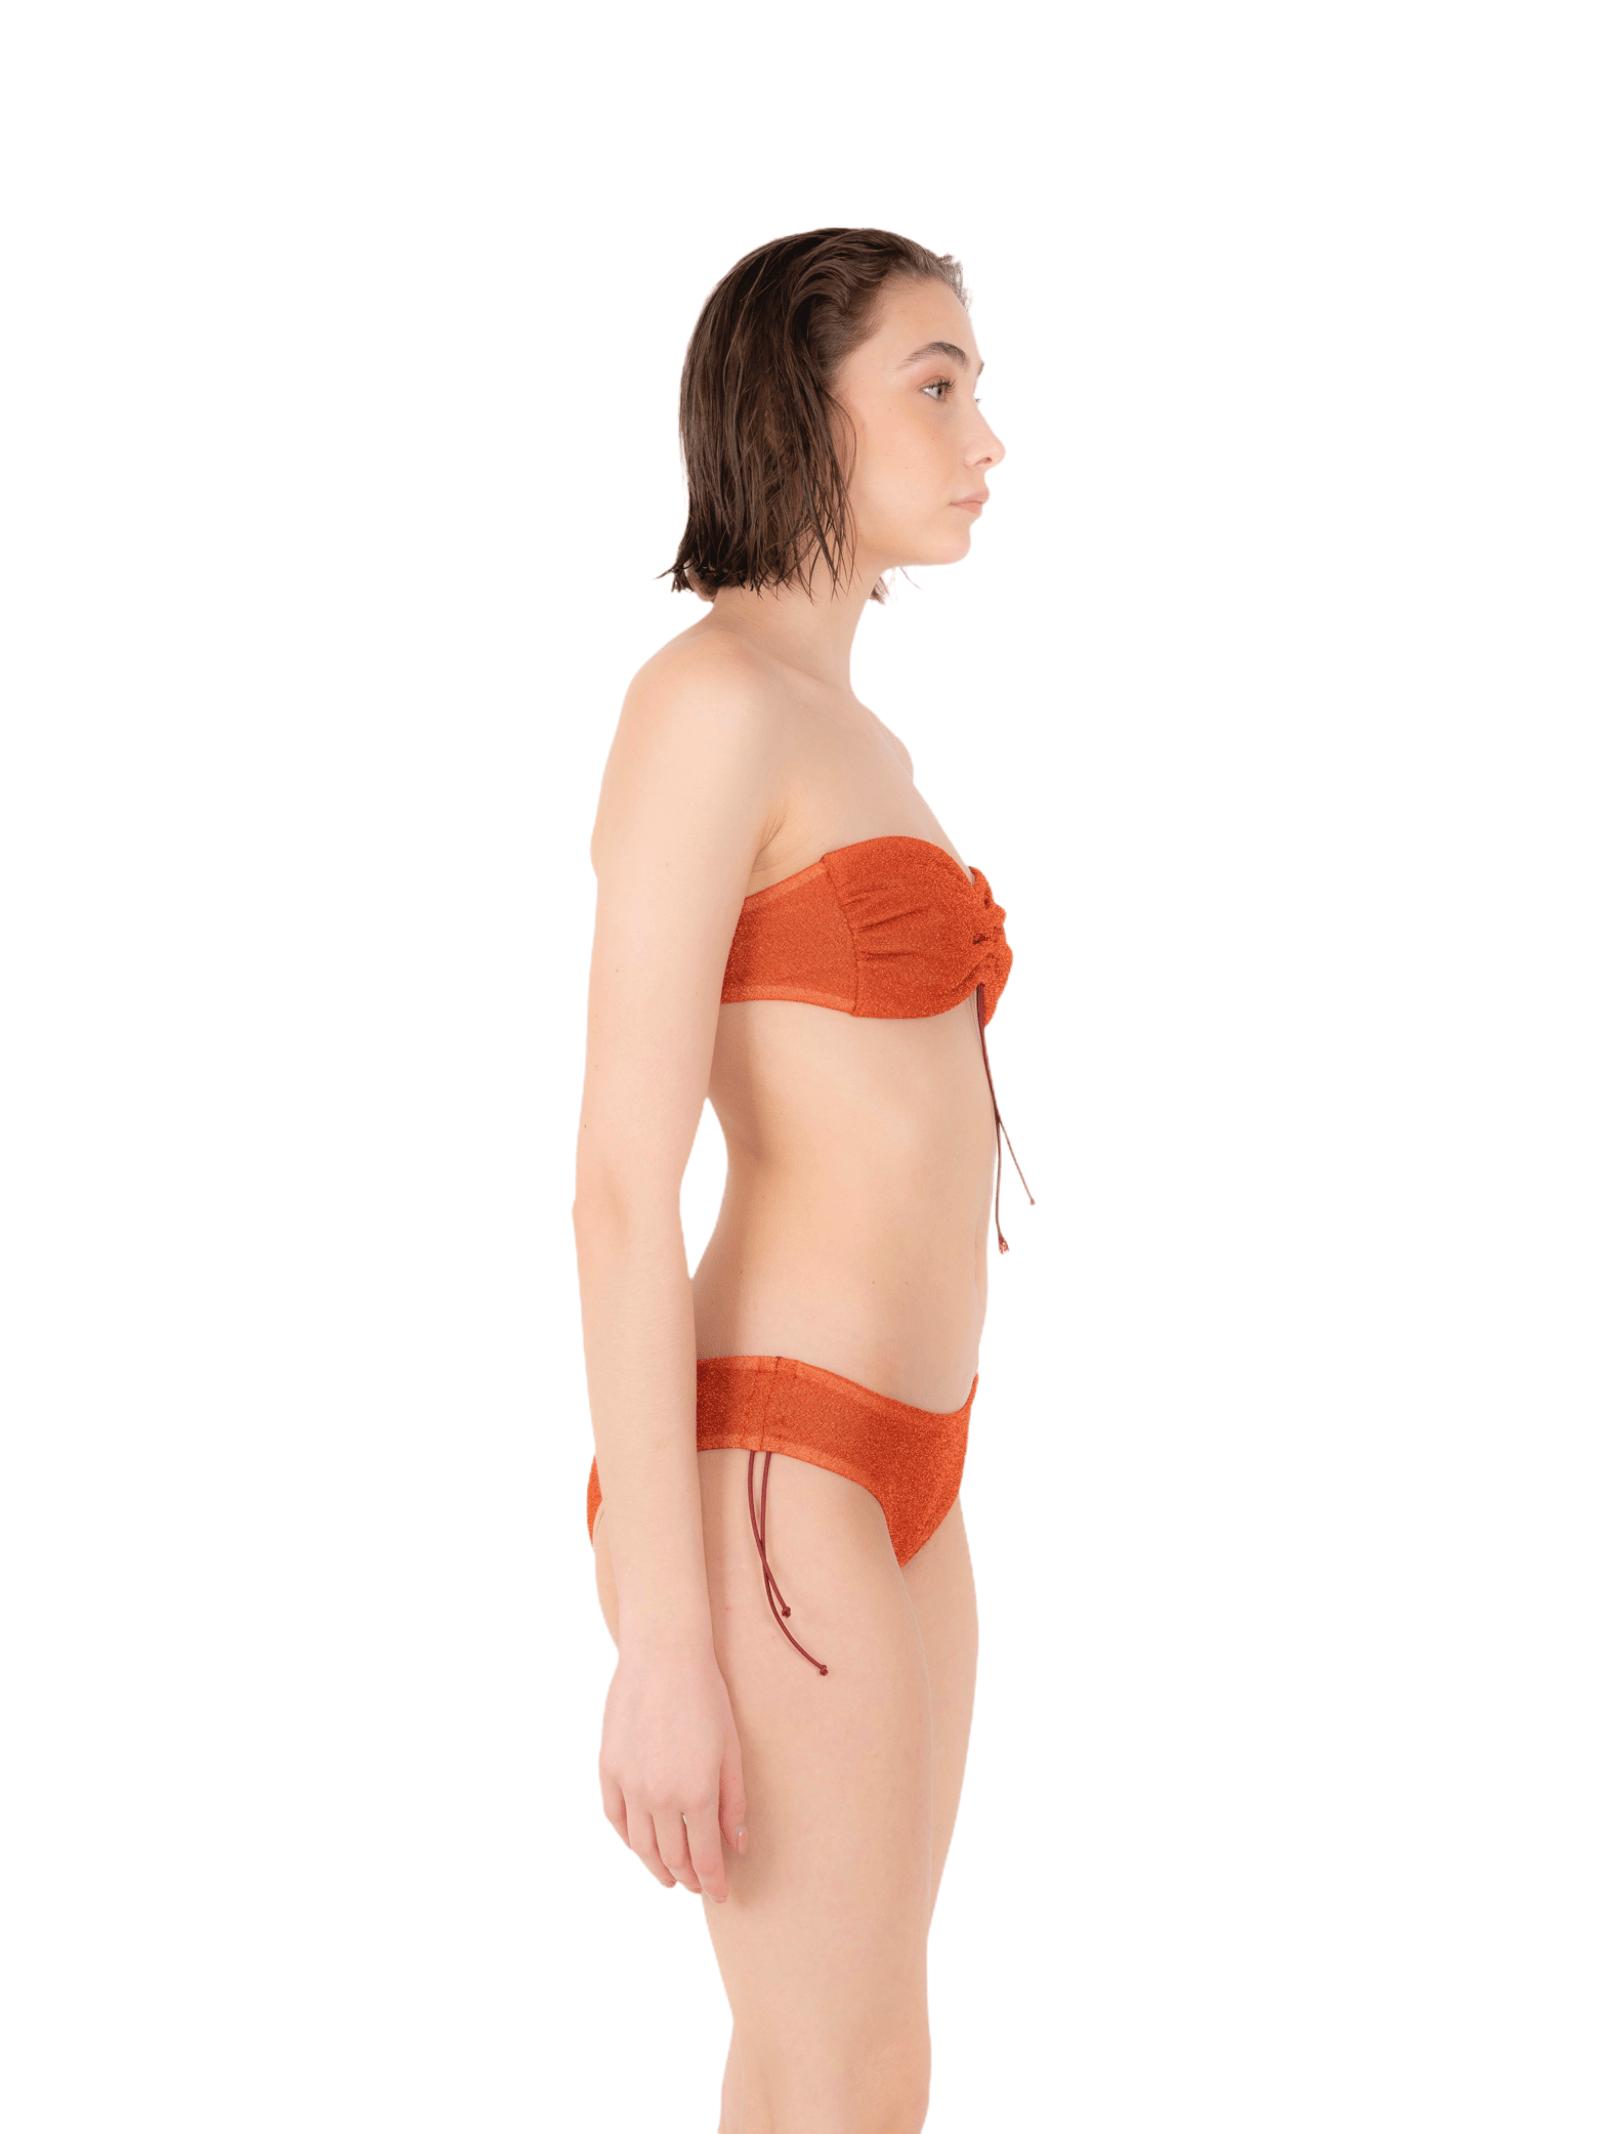 Bikini top with drawstring slip ANNAMARE | 23 | BK-114ARANCIONE